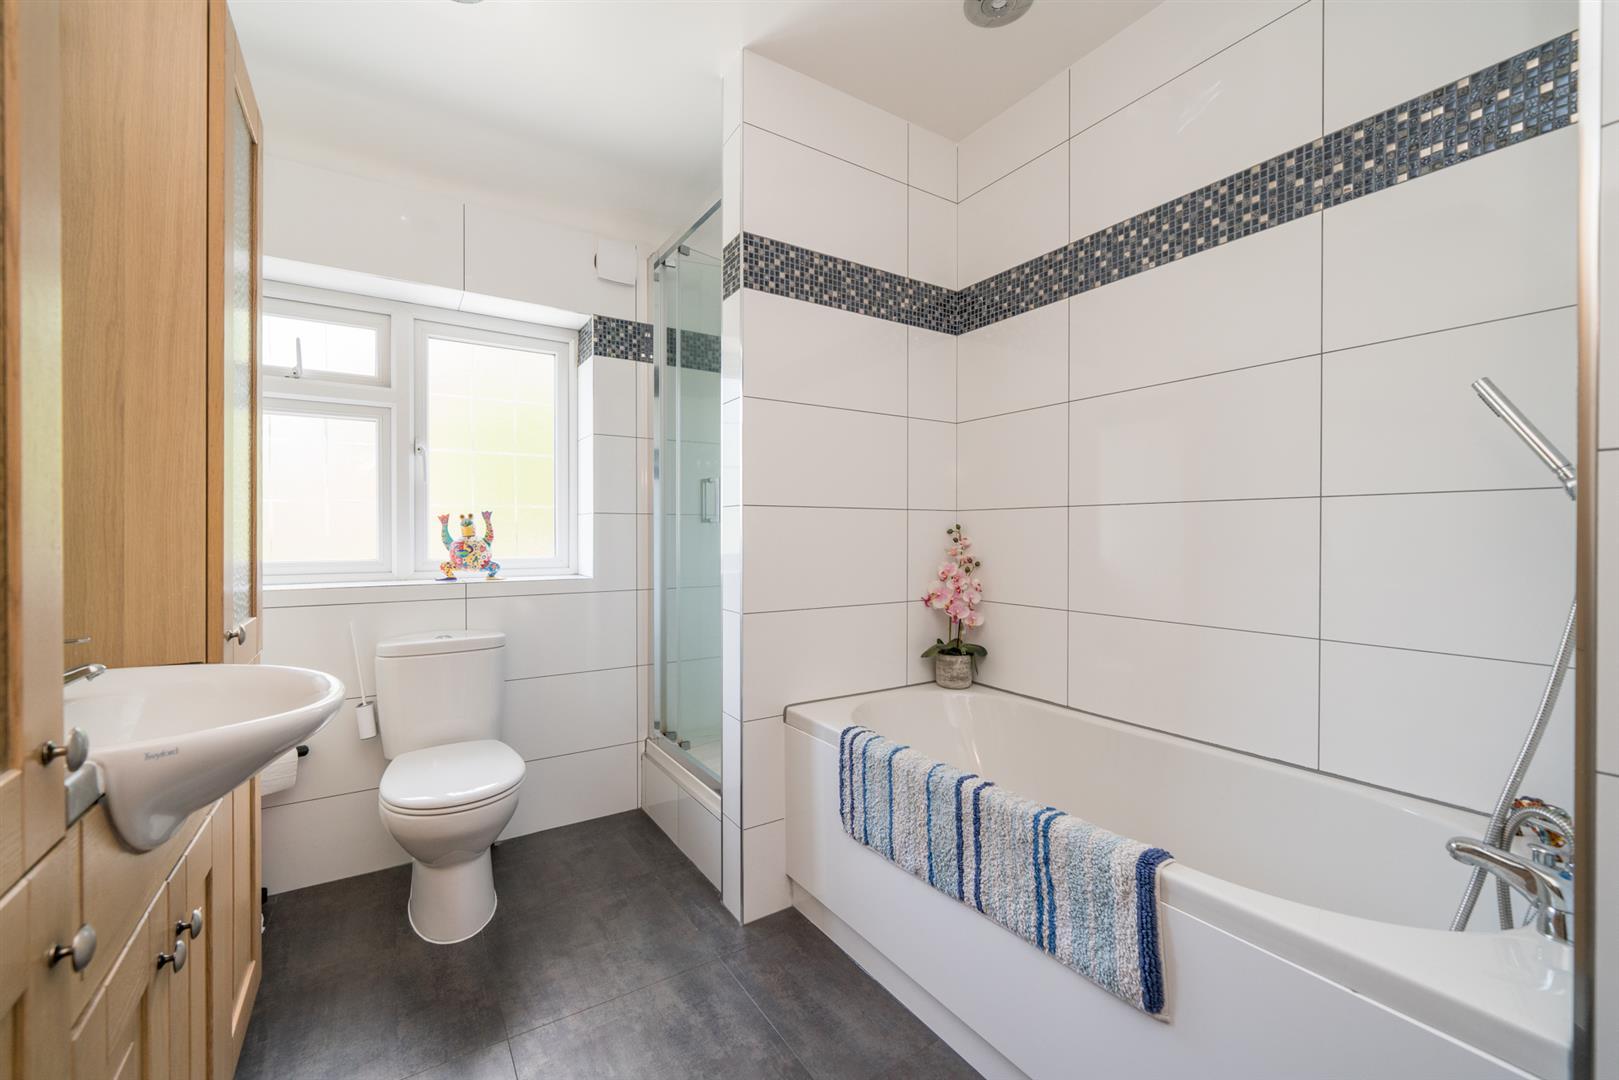 12-Ranelagh-Road-1020 - bathroom.jpg